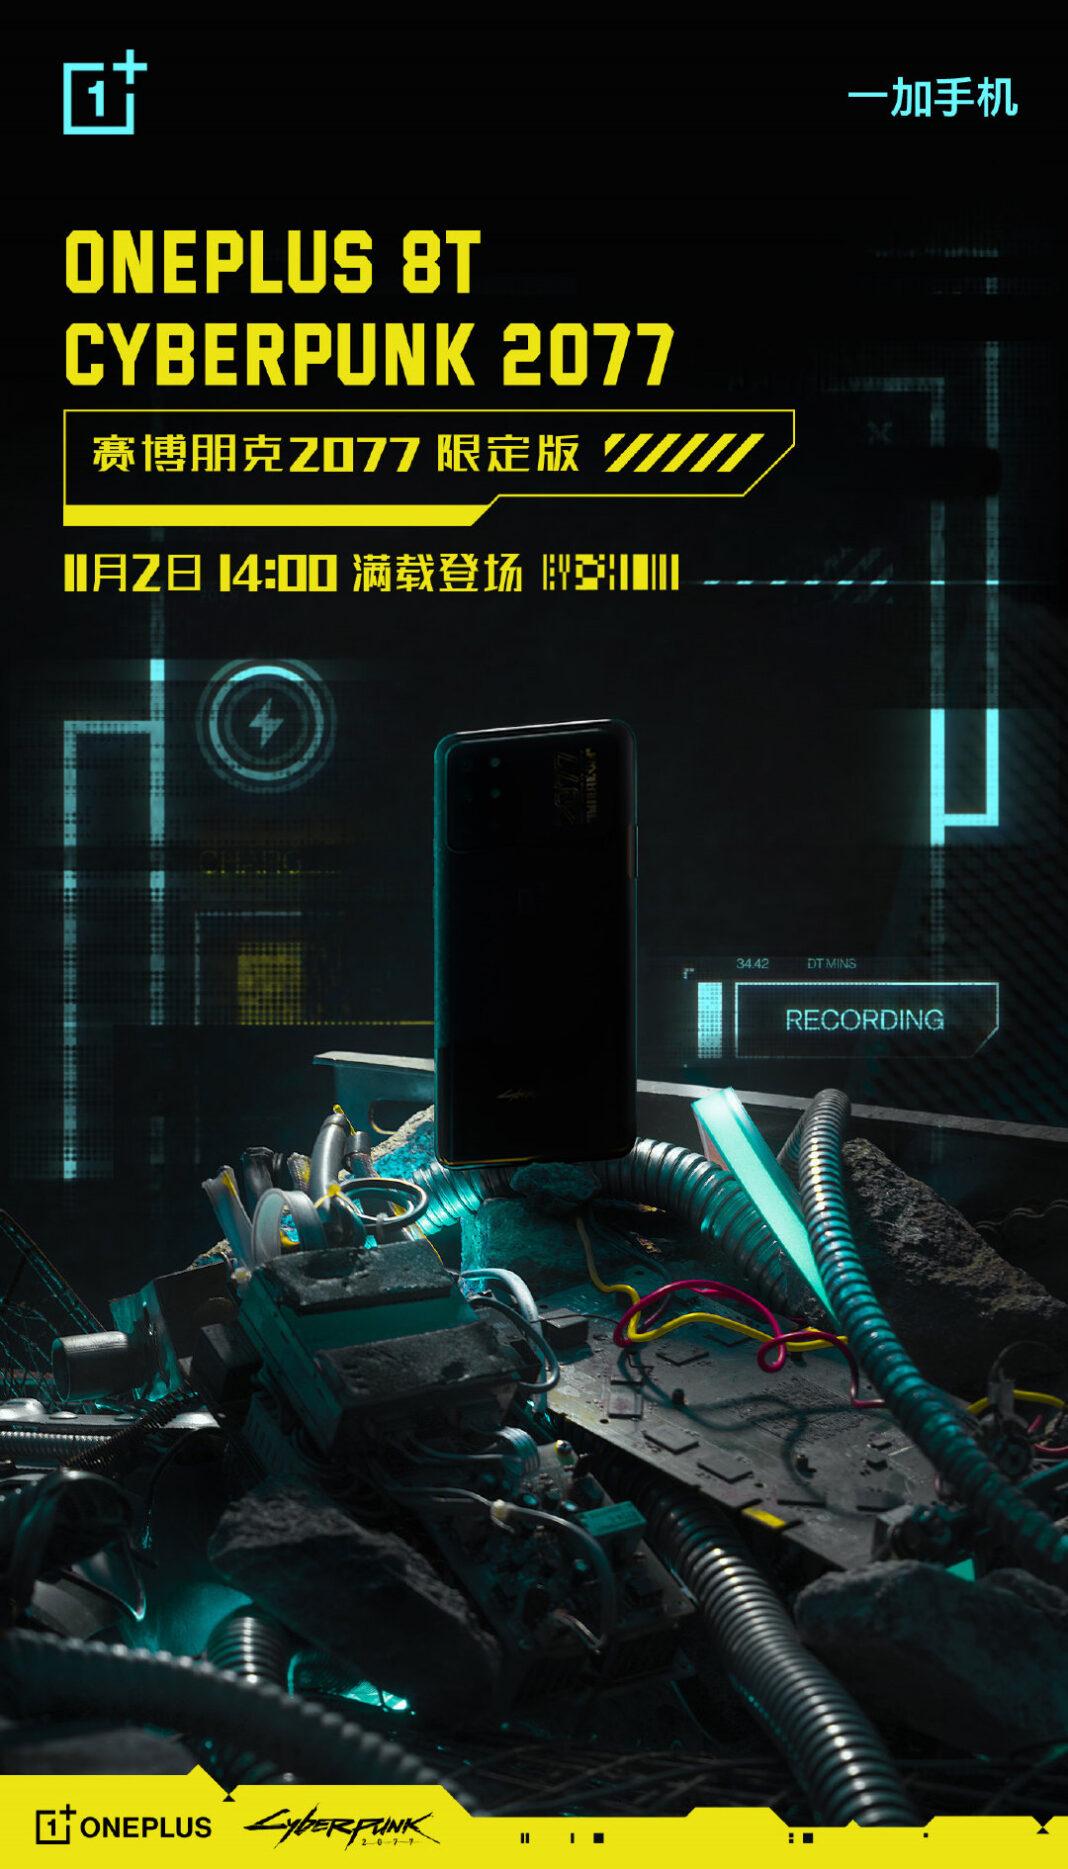 Презентация OnePlus 8T Cyberpunk 2077 Limited Edition